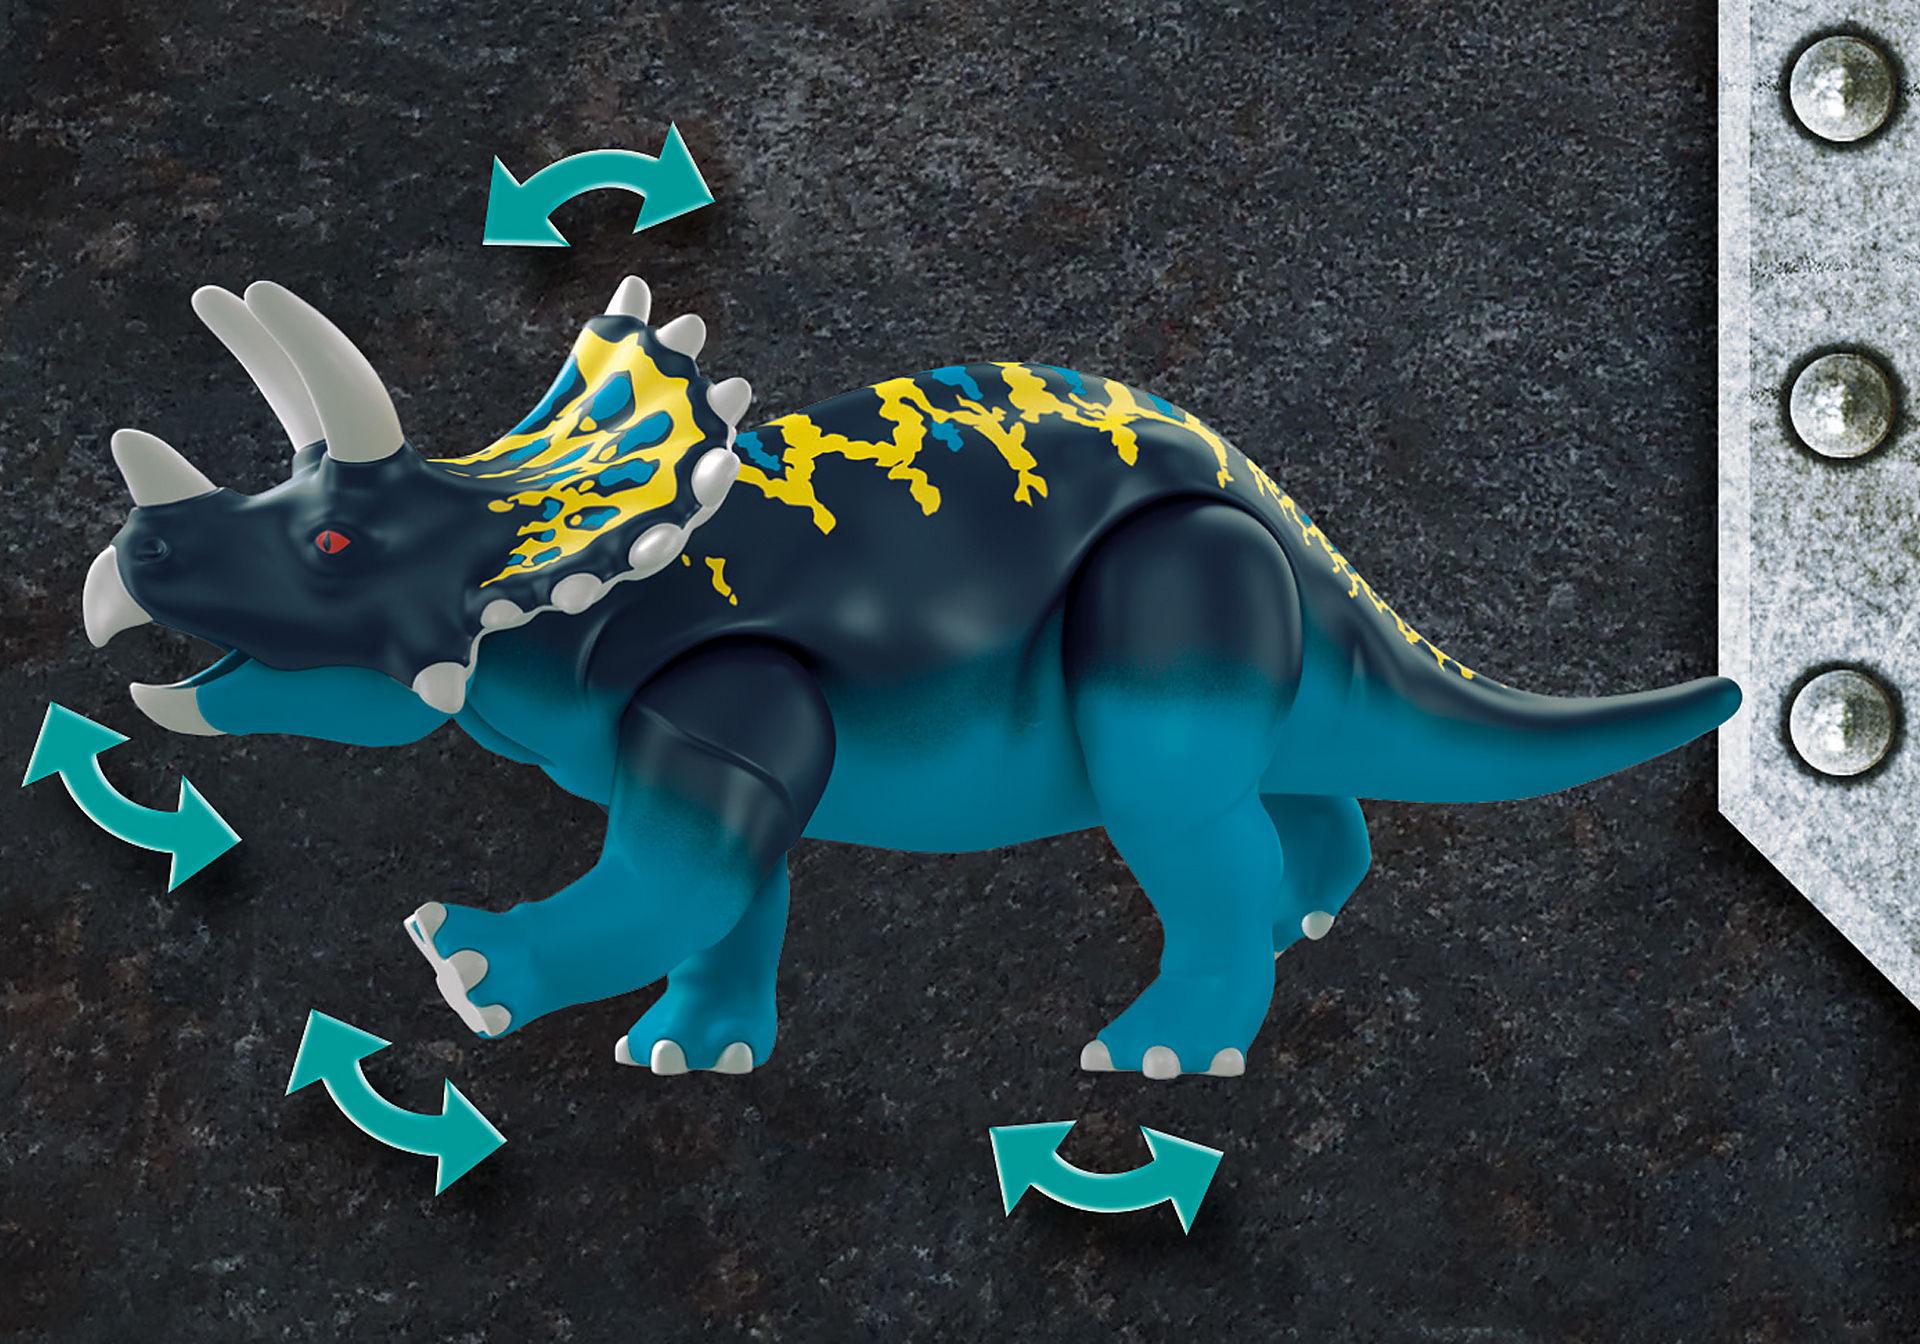 70627 Triceraptos: Disturbios por las piedras legendarias zoom image3